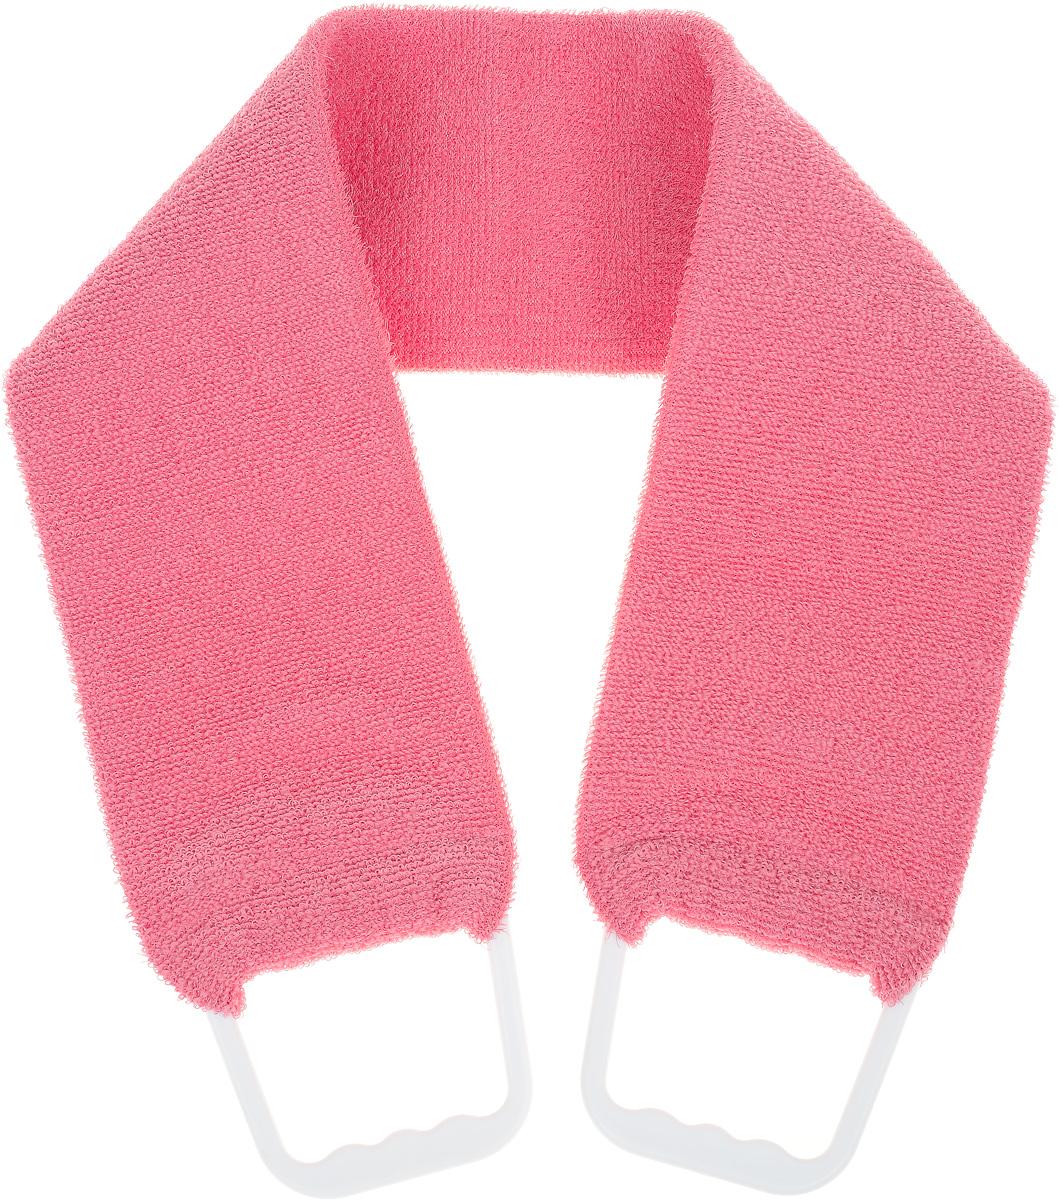 Riffi Мочалка-пояс, двухсторонняя, цвет: коралловый мочалка варежка массажная riffi вязаная 190